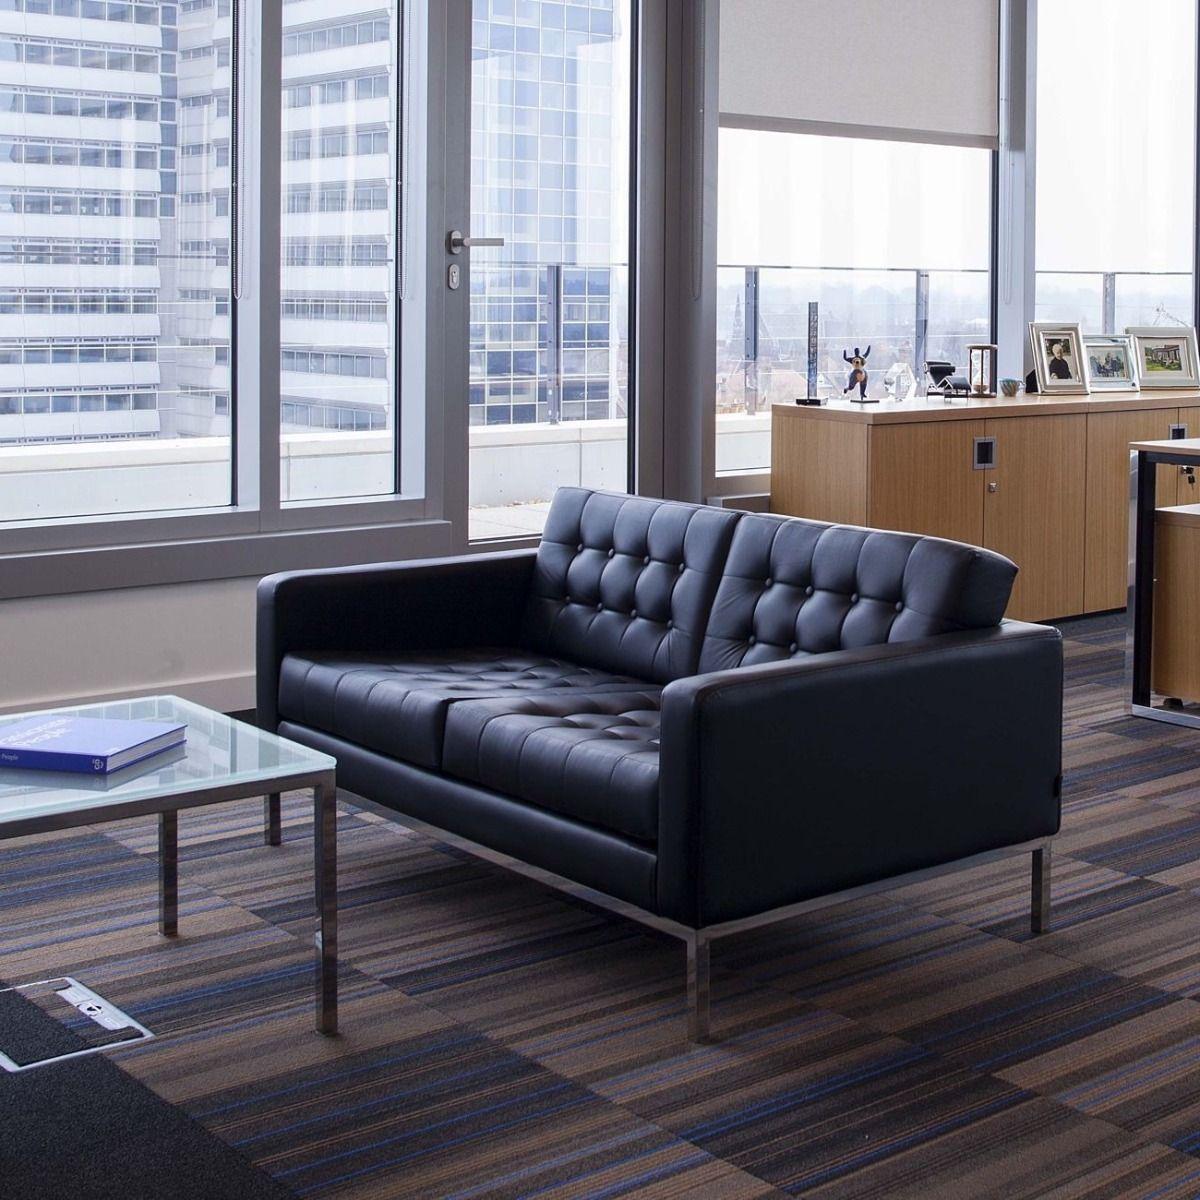 Robin Day Club sofa in an office